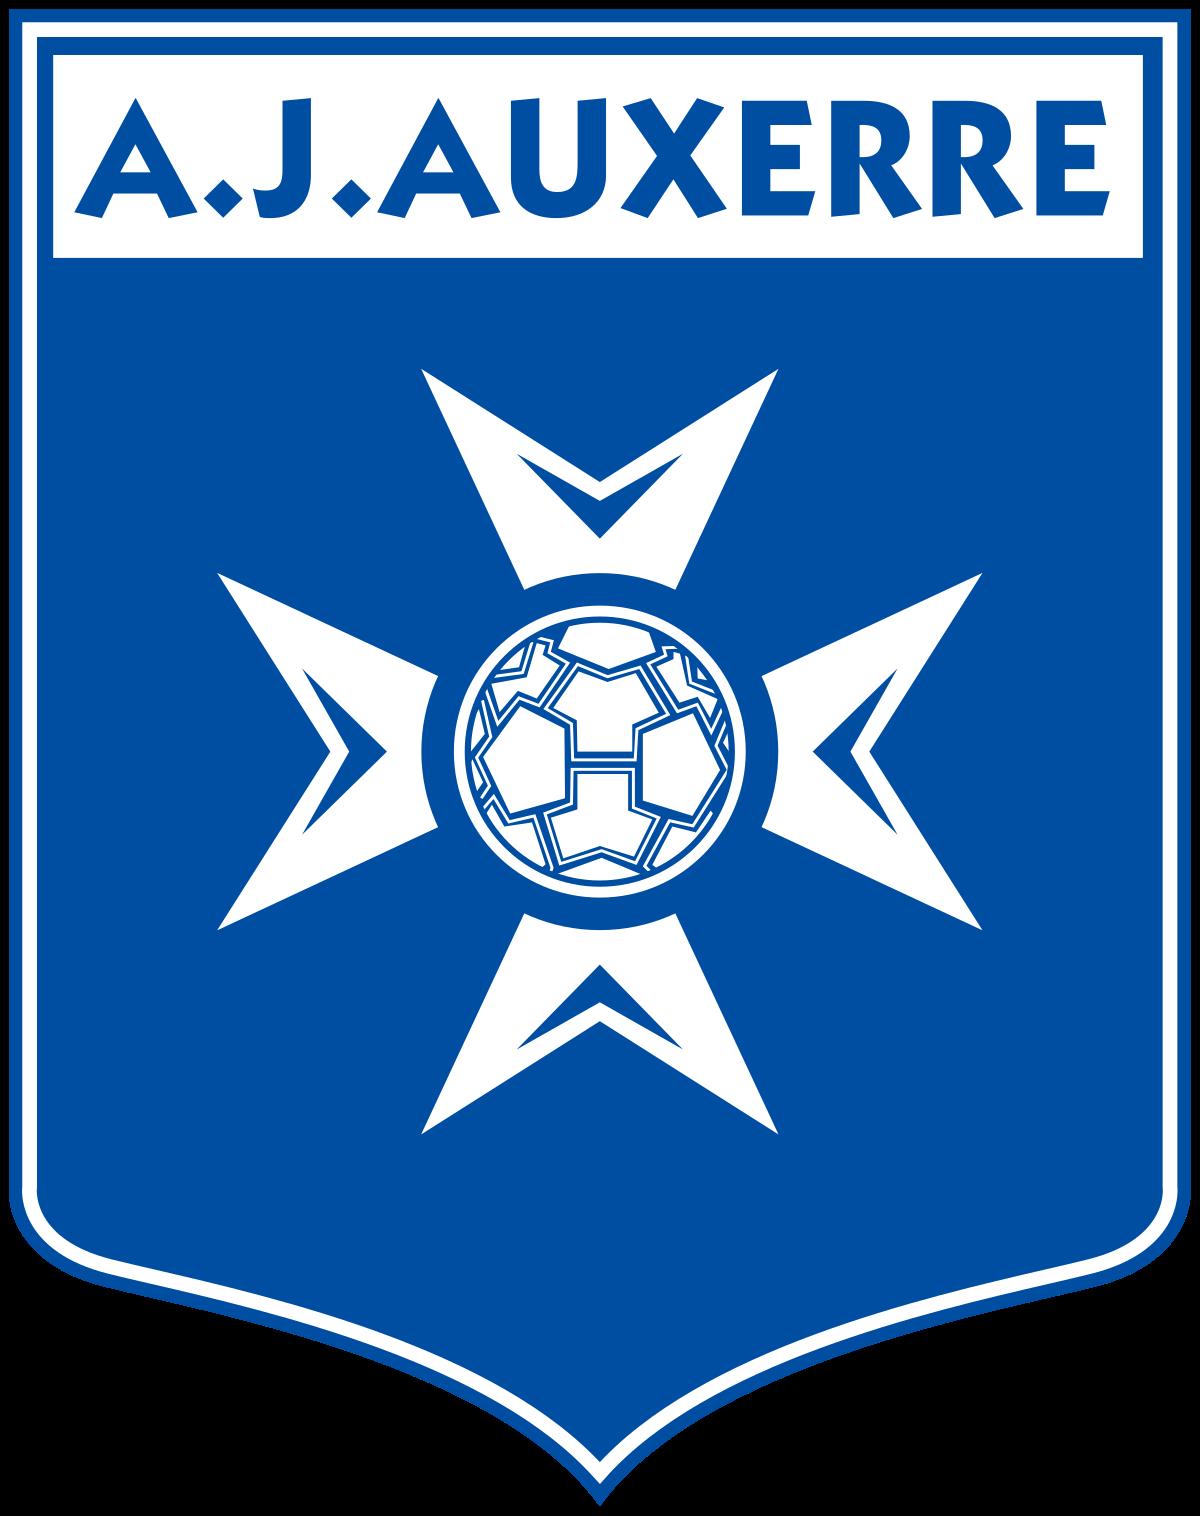 Marveld Tournament - Logo AJ Auxerre